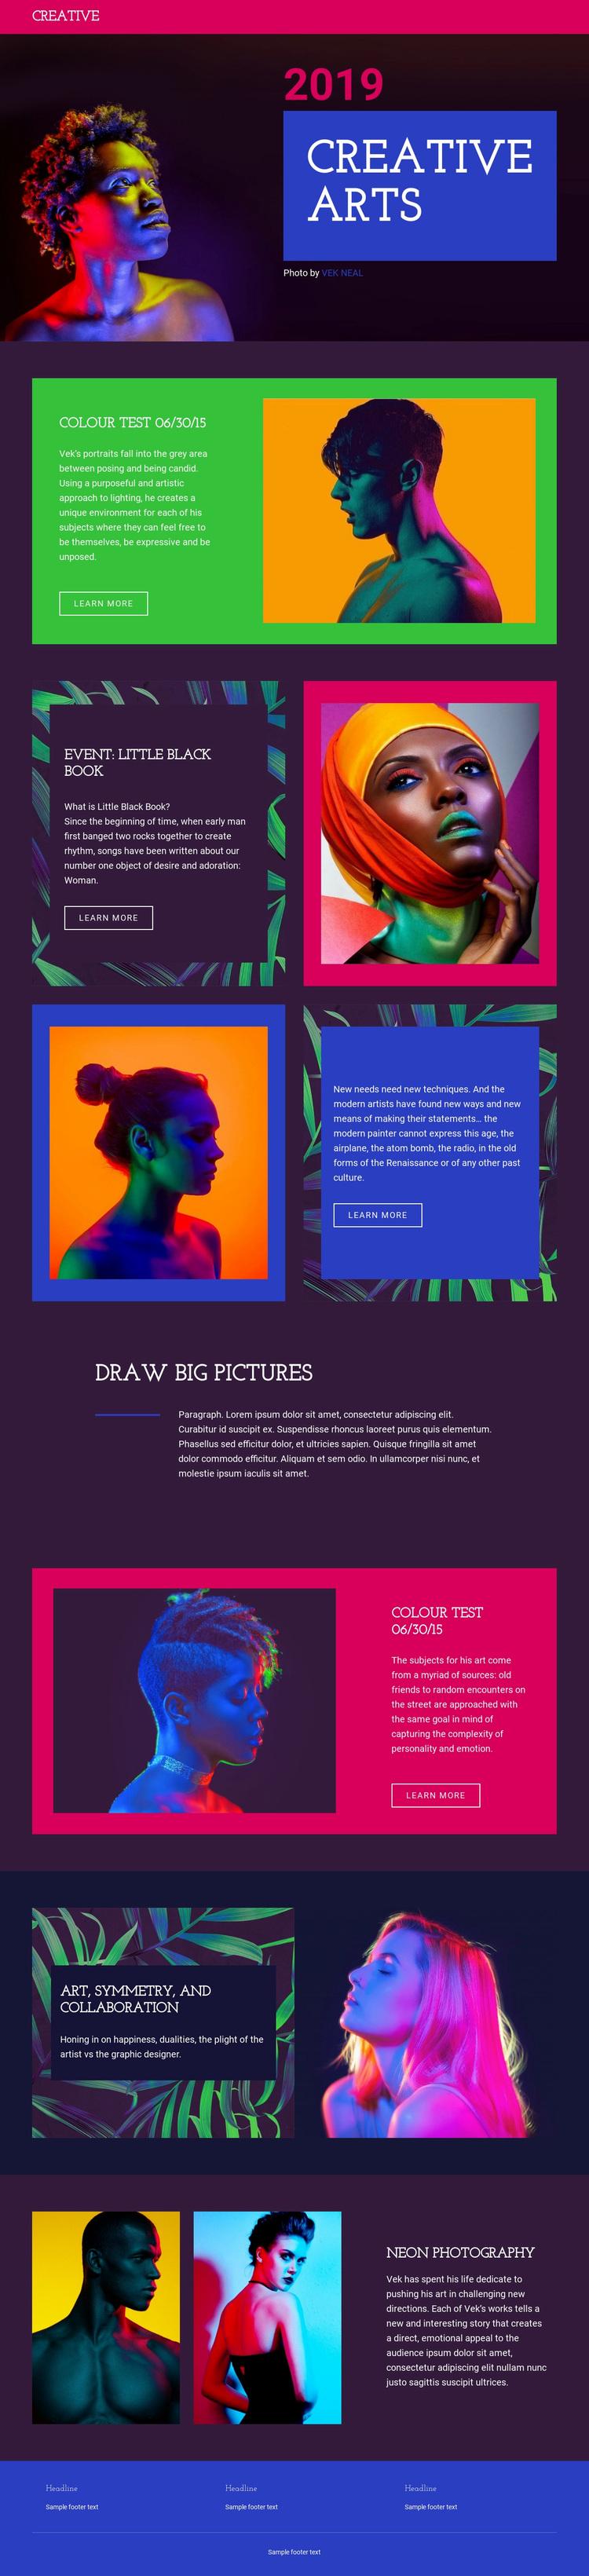 Creative Arts Website Design